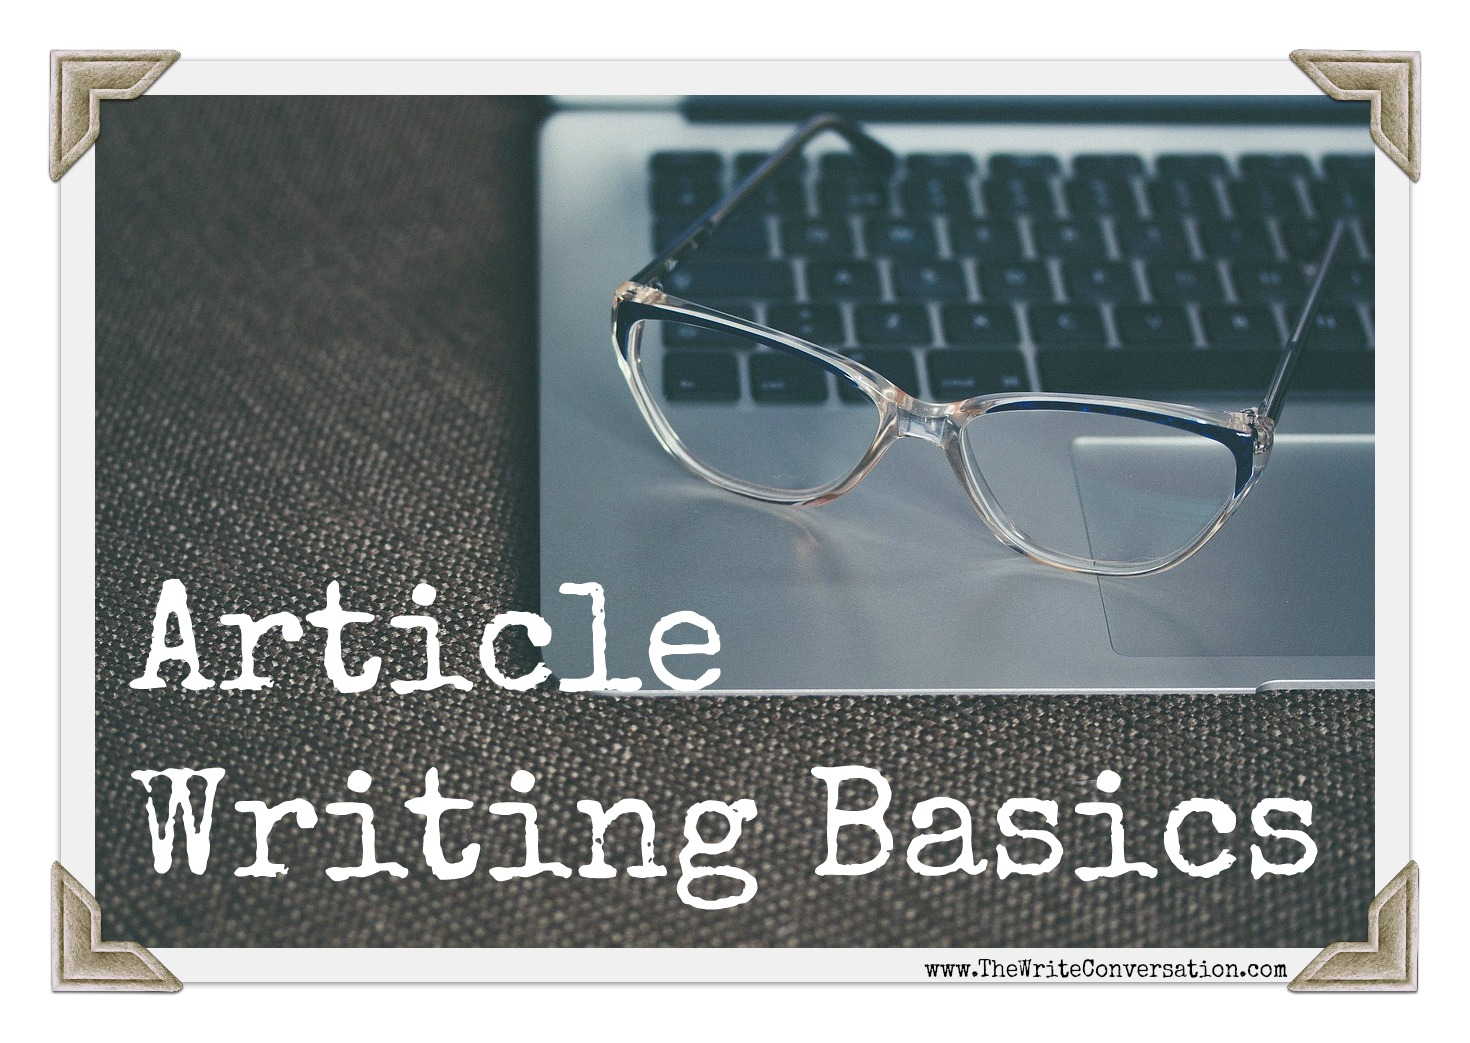 Edie Melson 39 S Blog Article Writing Basics November 09: calligraphy basics